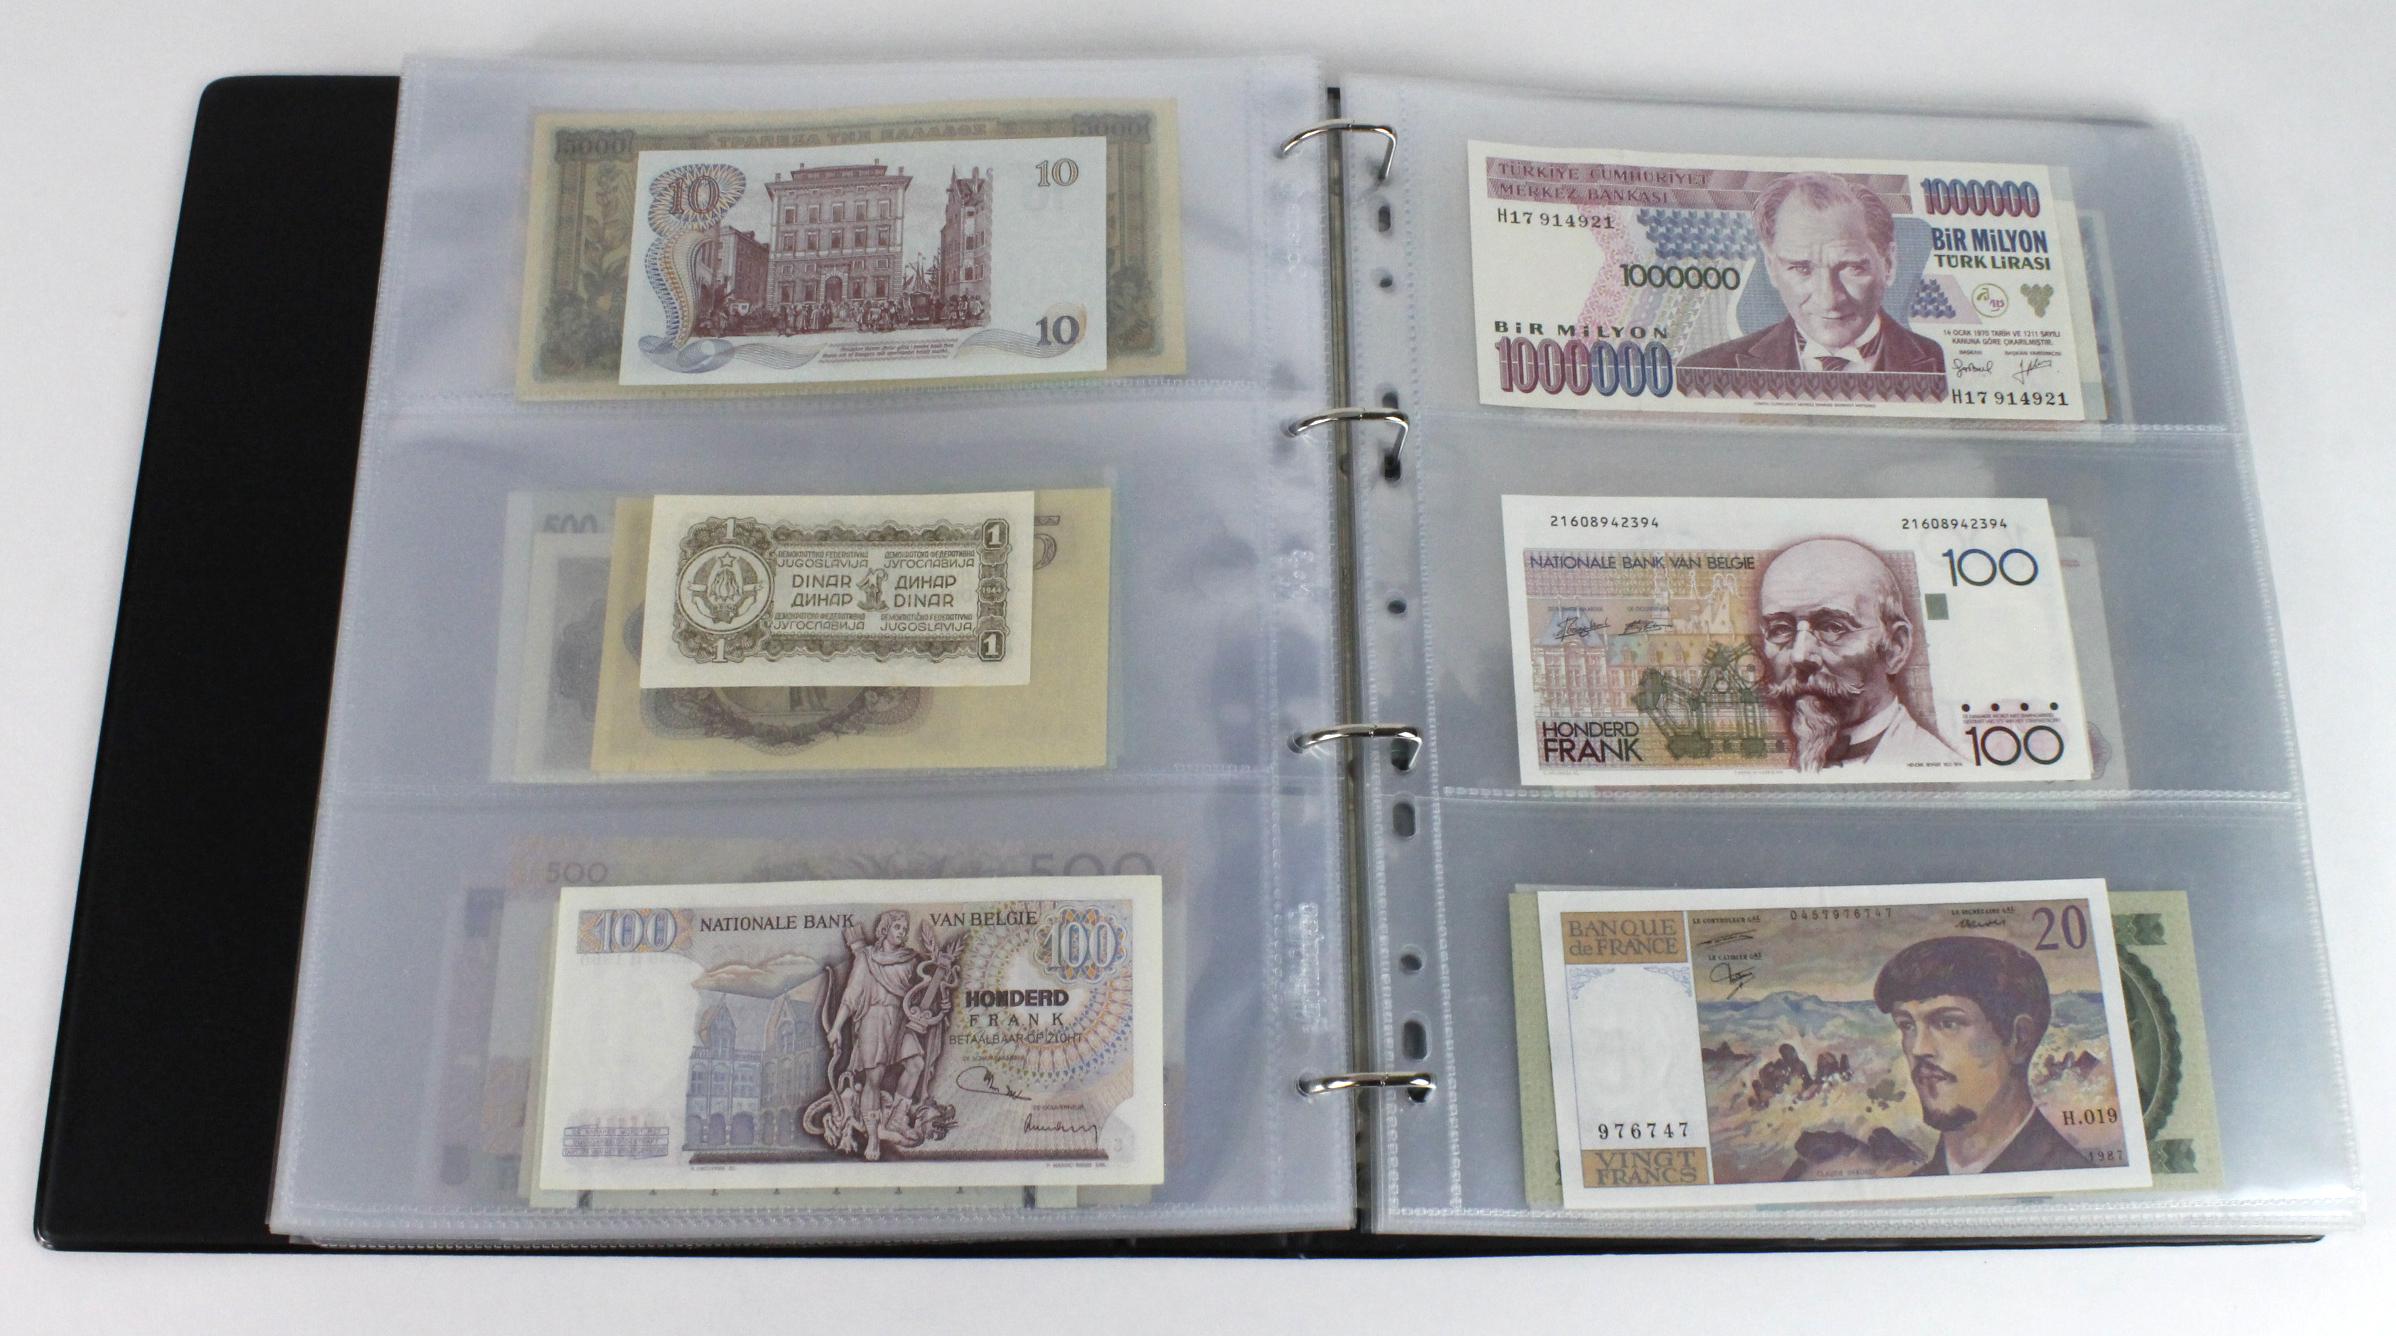 World (163), in banknote album including Bahamas, Spain, Sweden, Netherlands, Algeria, Macau, - Image 40 of 57